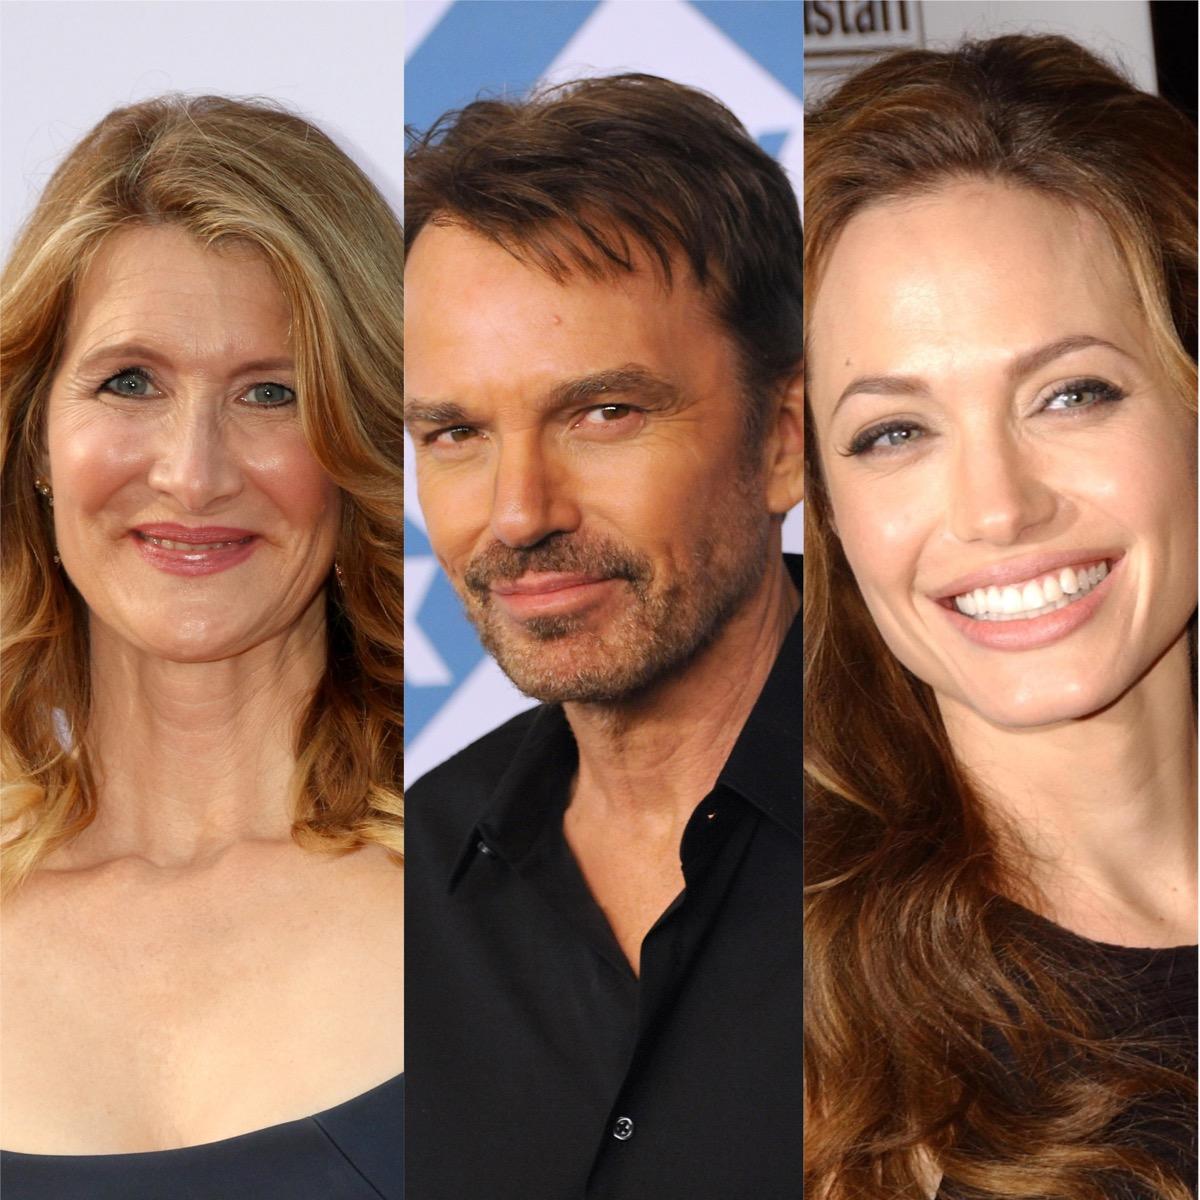 Laura Dern, Billy Bob Thornton, and Angelina Jolie